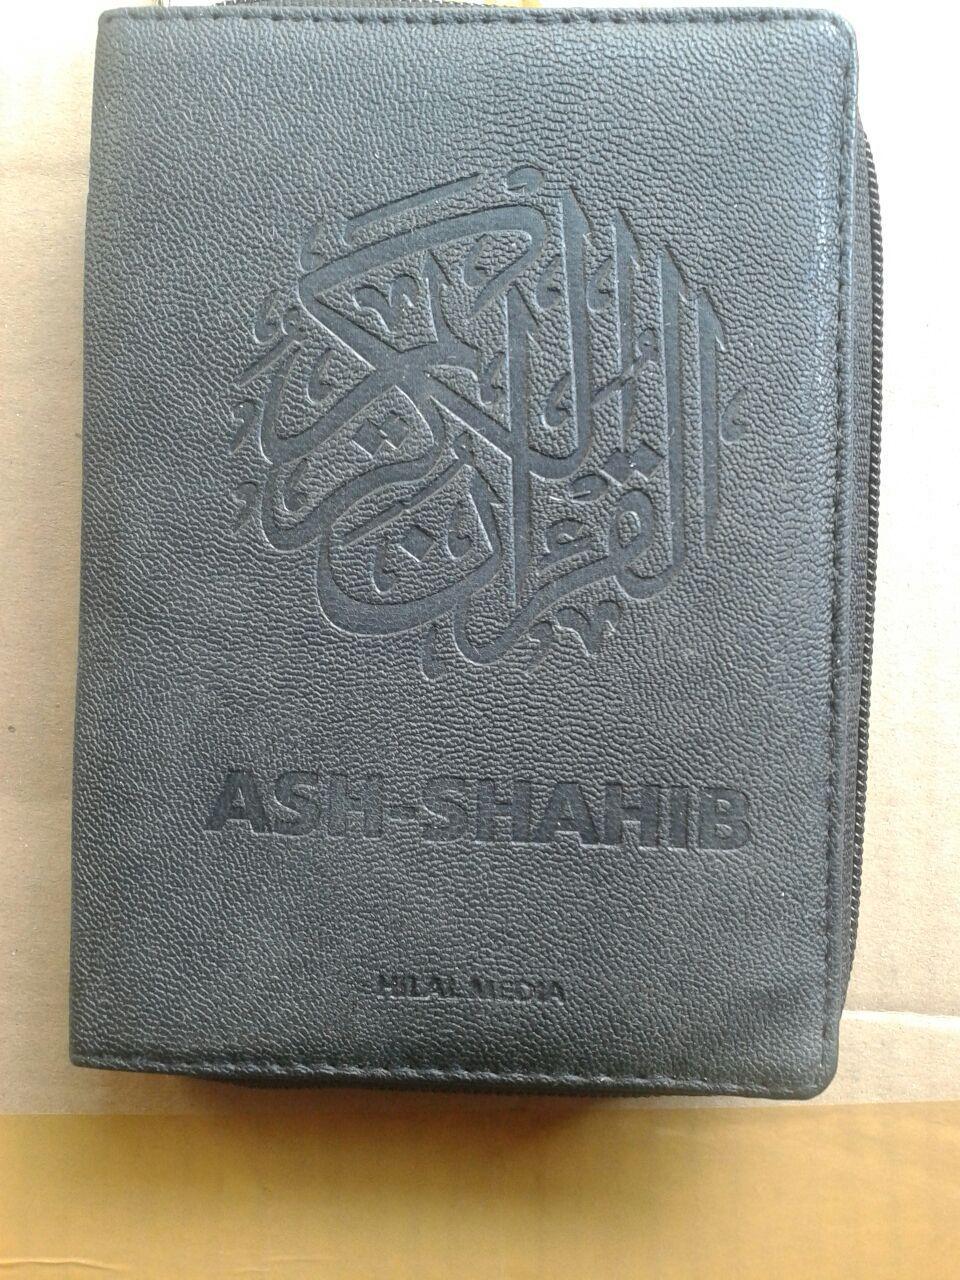 Al-Qur'an Terjemah Resleting Ash-Shahib Ukuran A6 cover